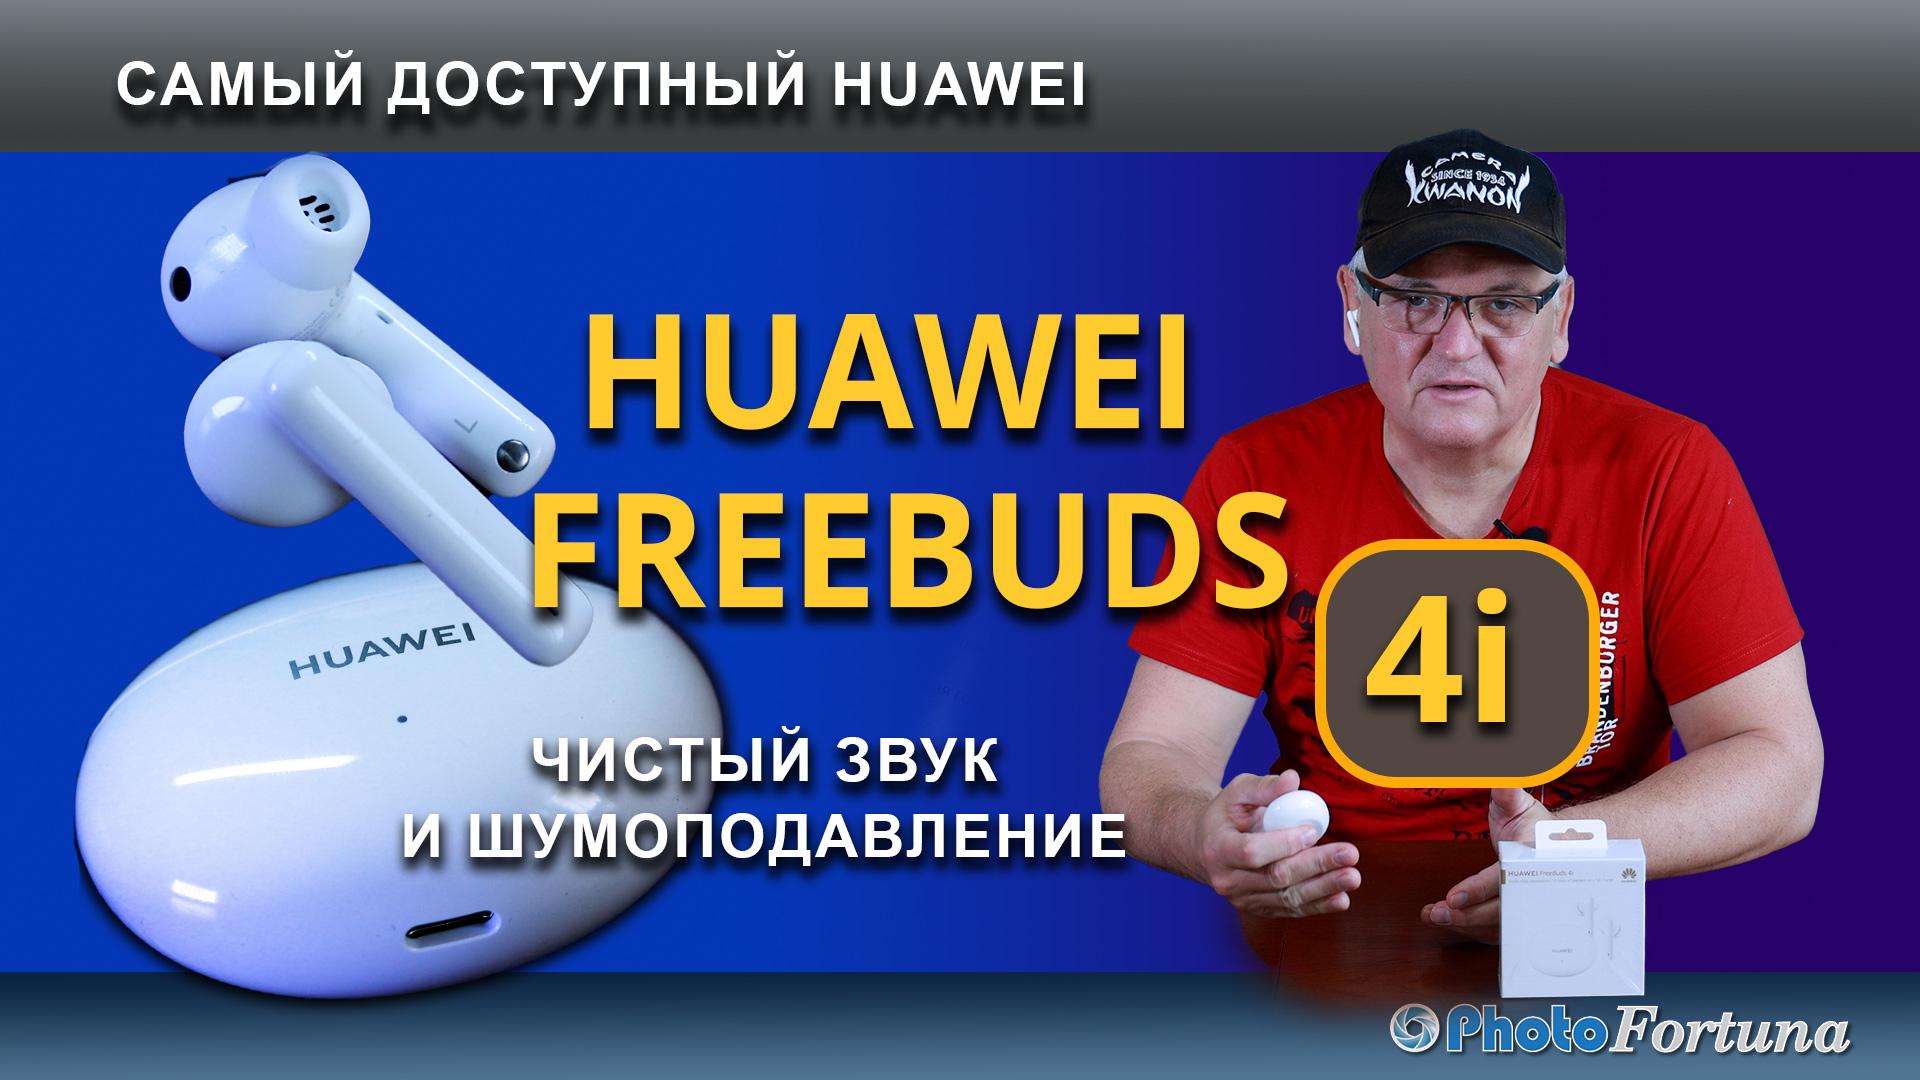 Read more about the article Huawei Freebuds 4i чистый звук и функция шумоподавление. Обзор TWS наушников.